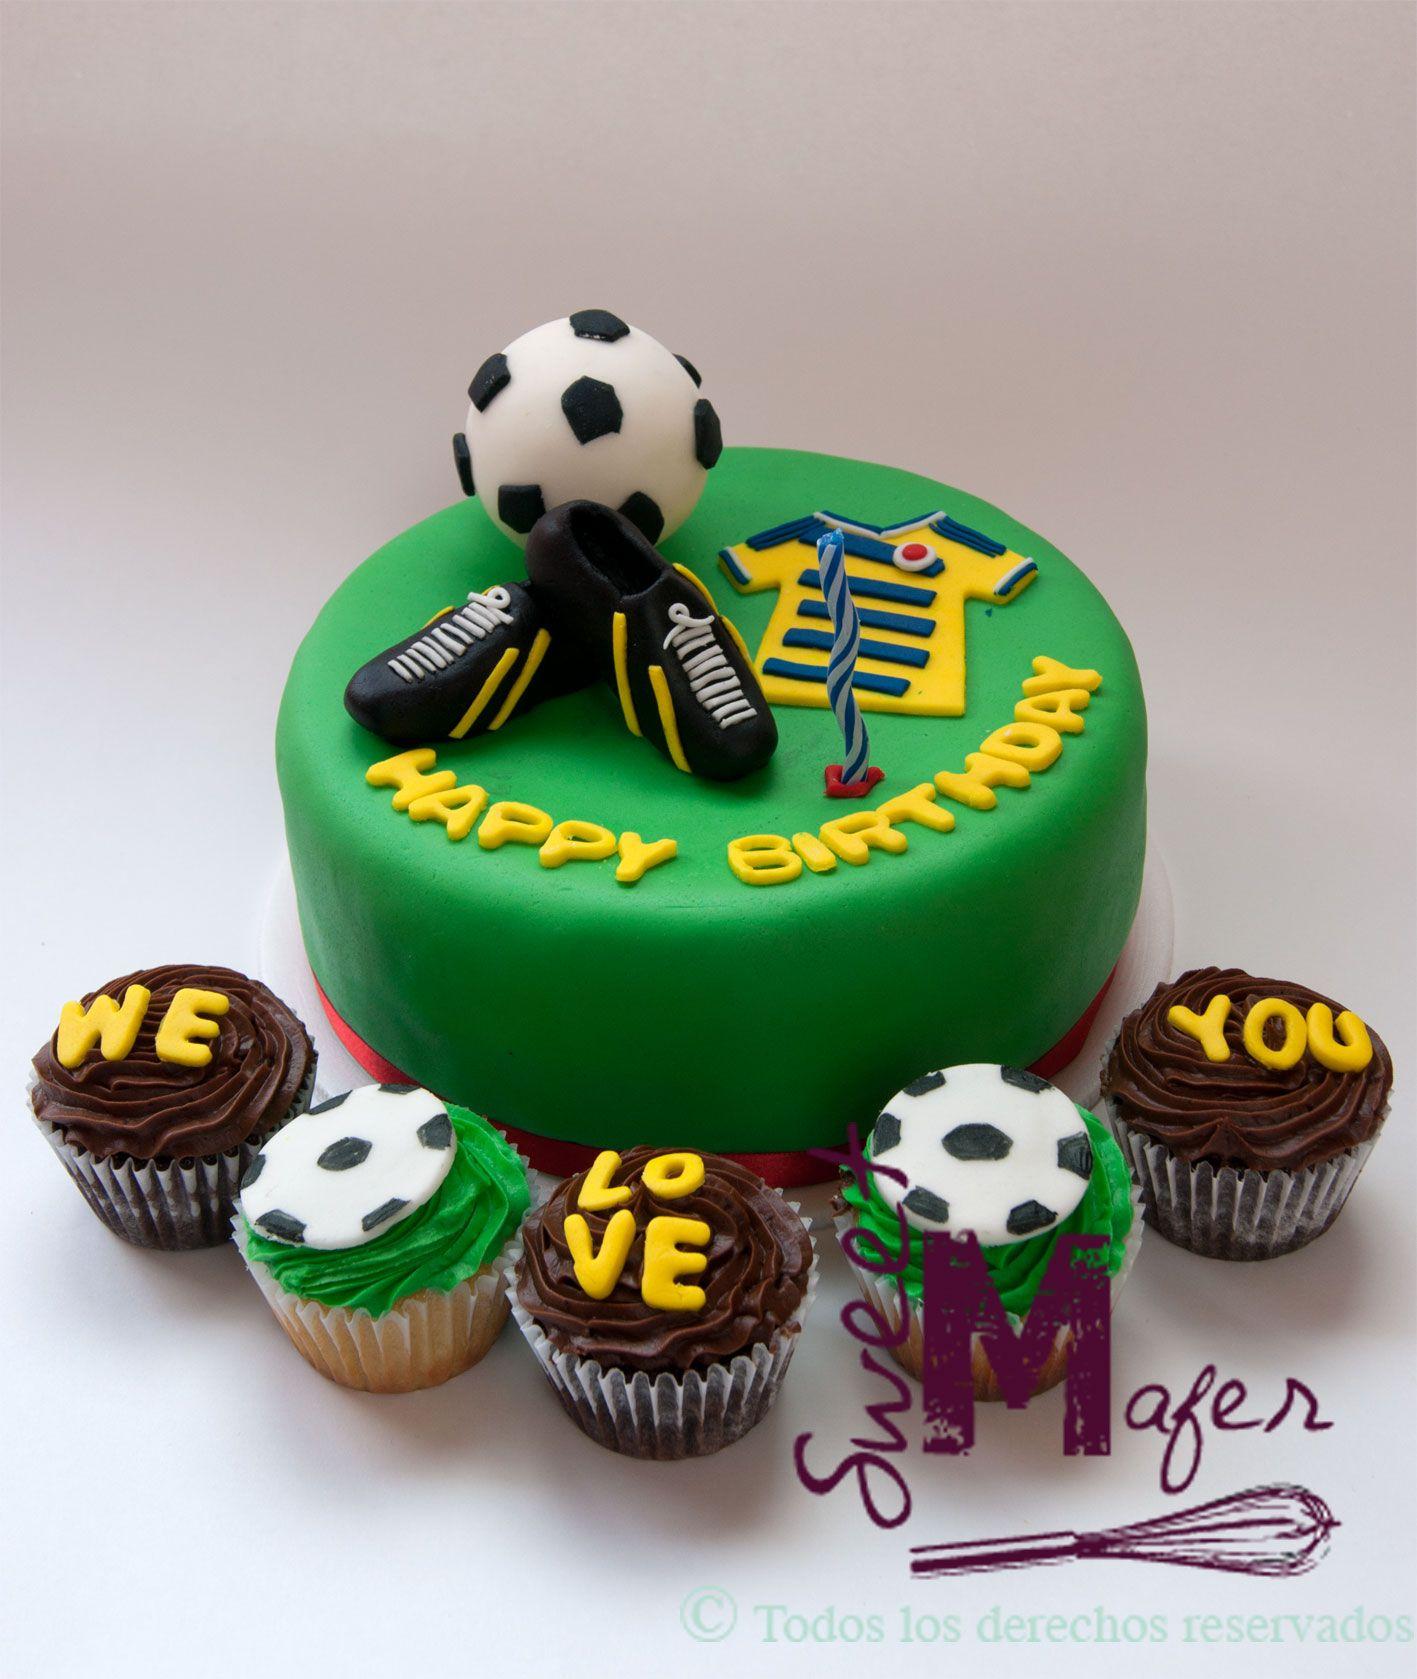 torta de cumple futbol - Buscar con Google | cumples ...